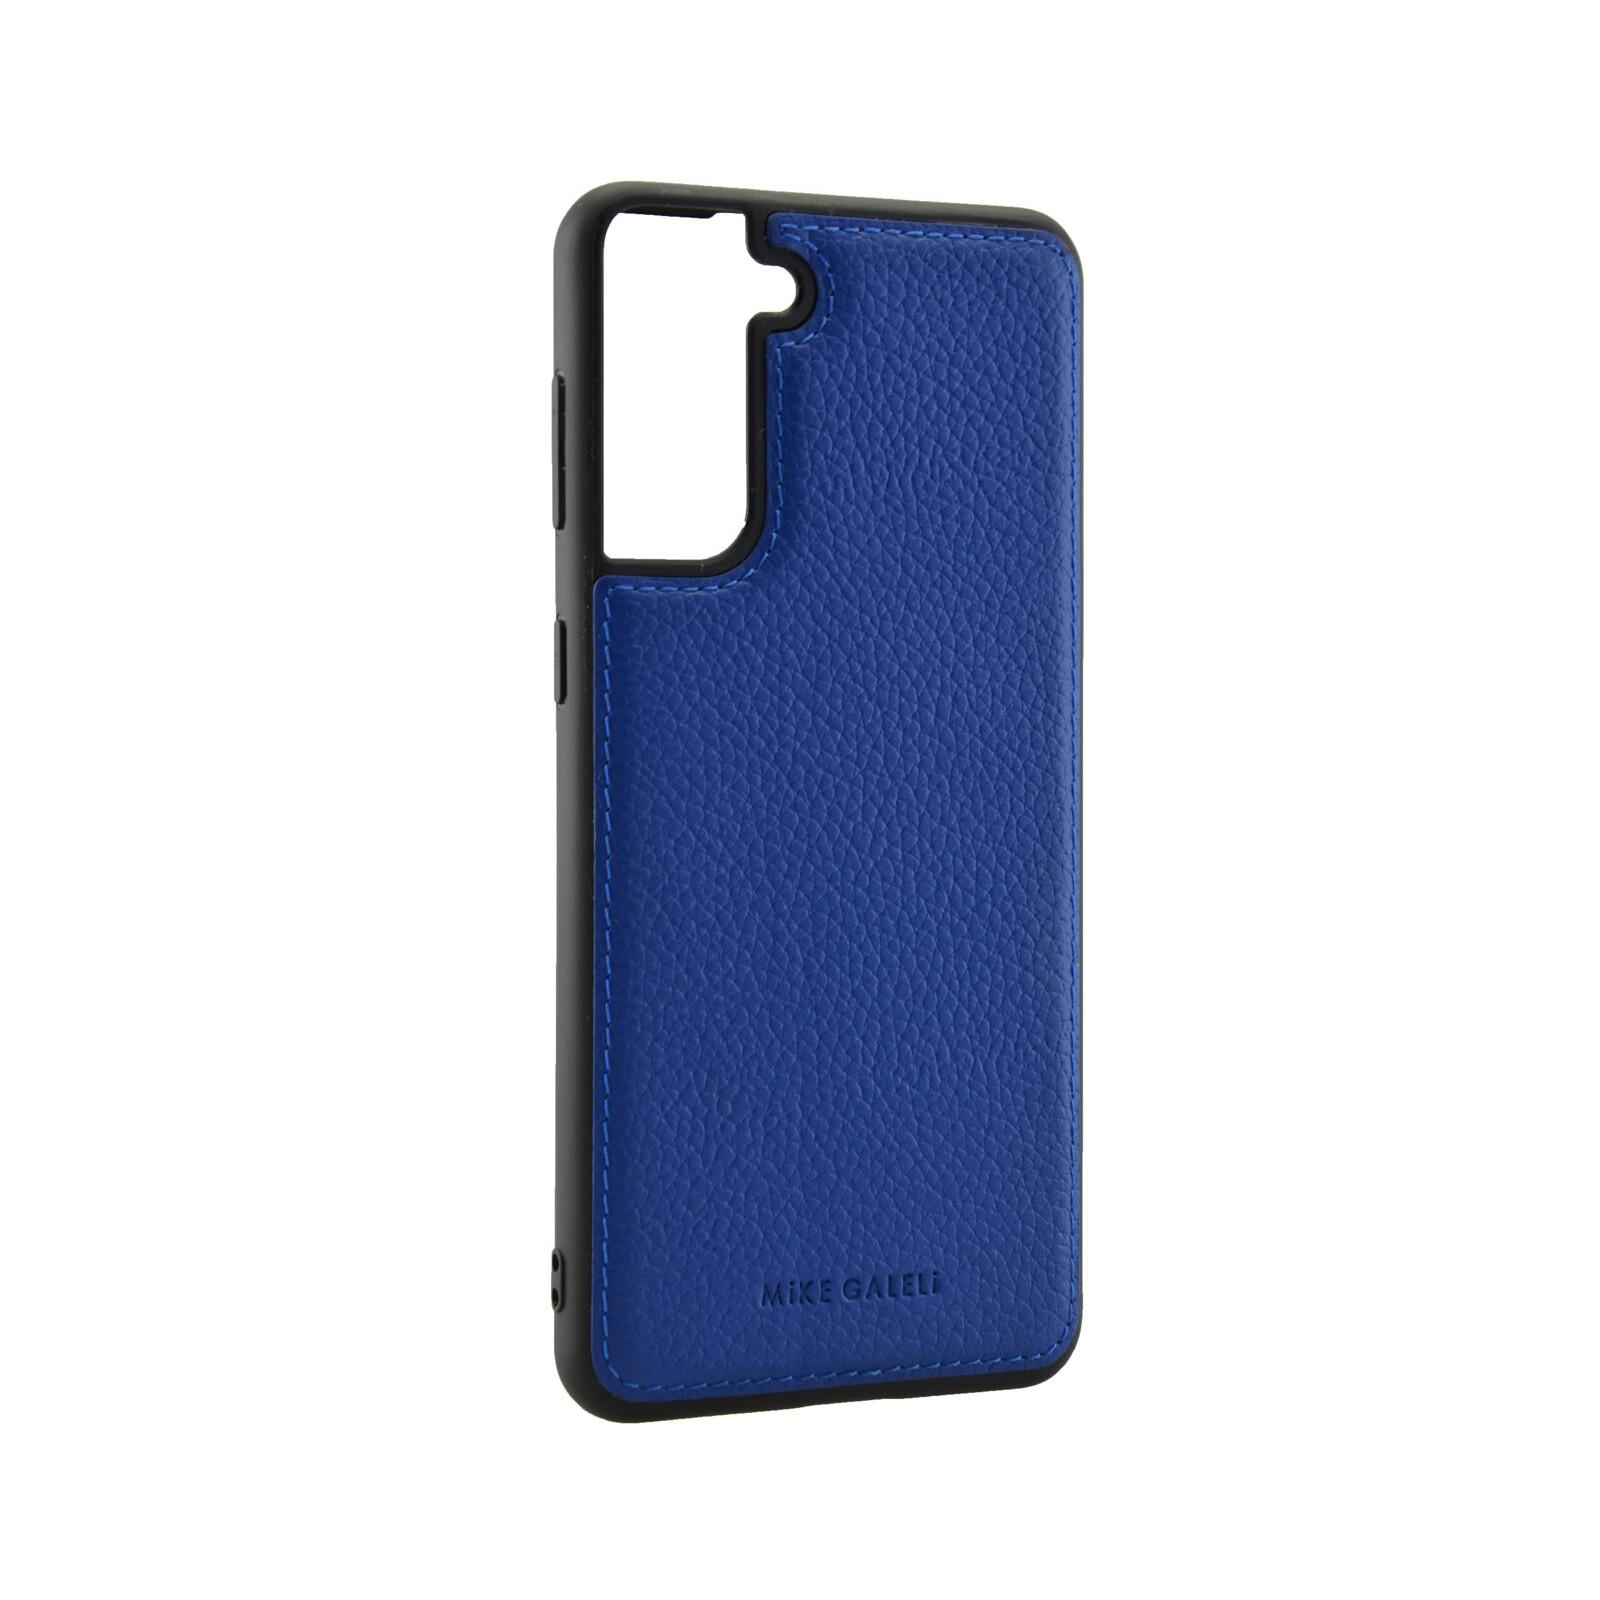 Galeli Back FINN Samsung Galaxy S21+ true blue